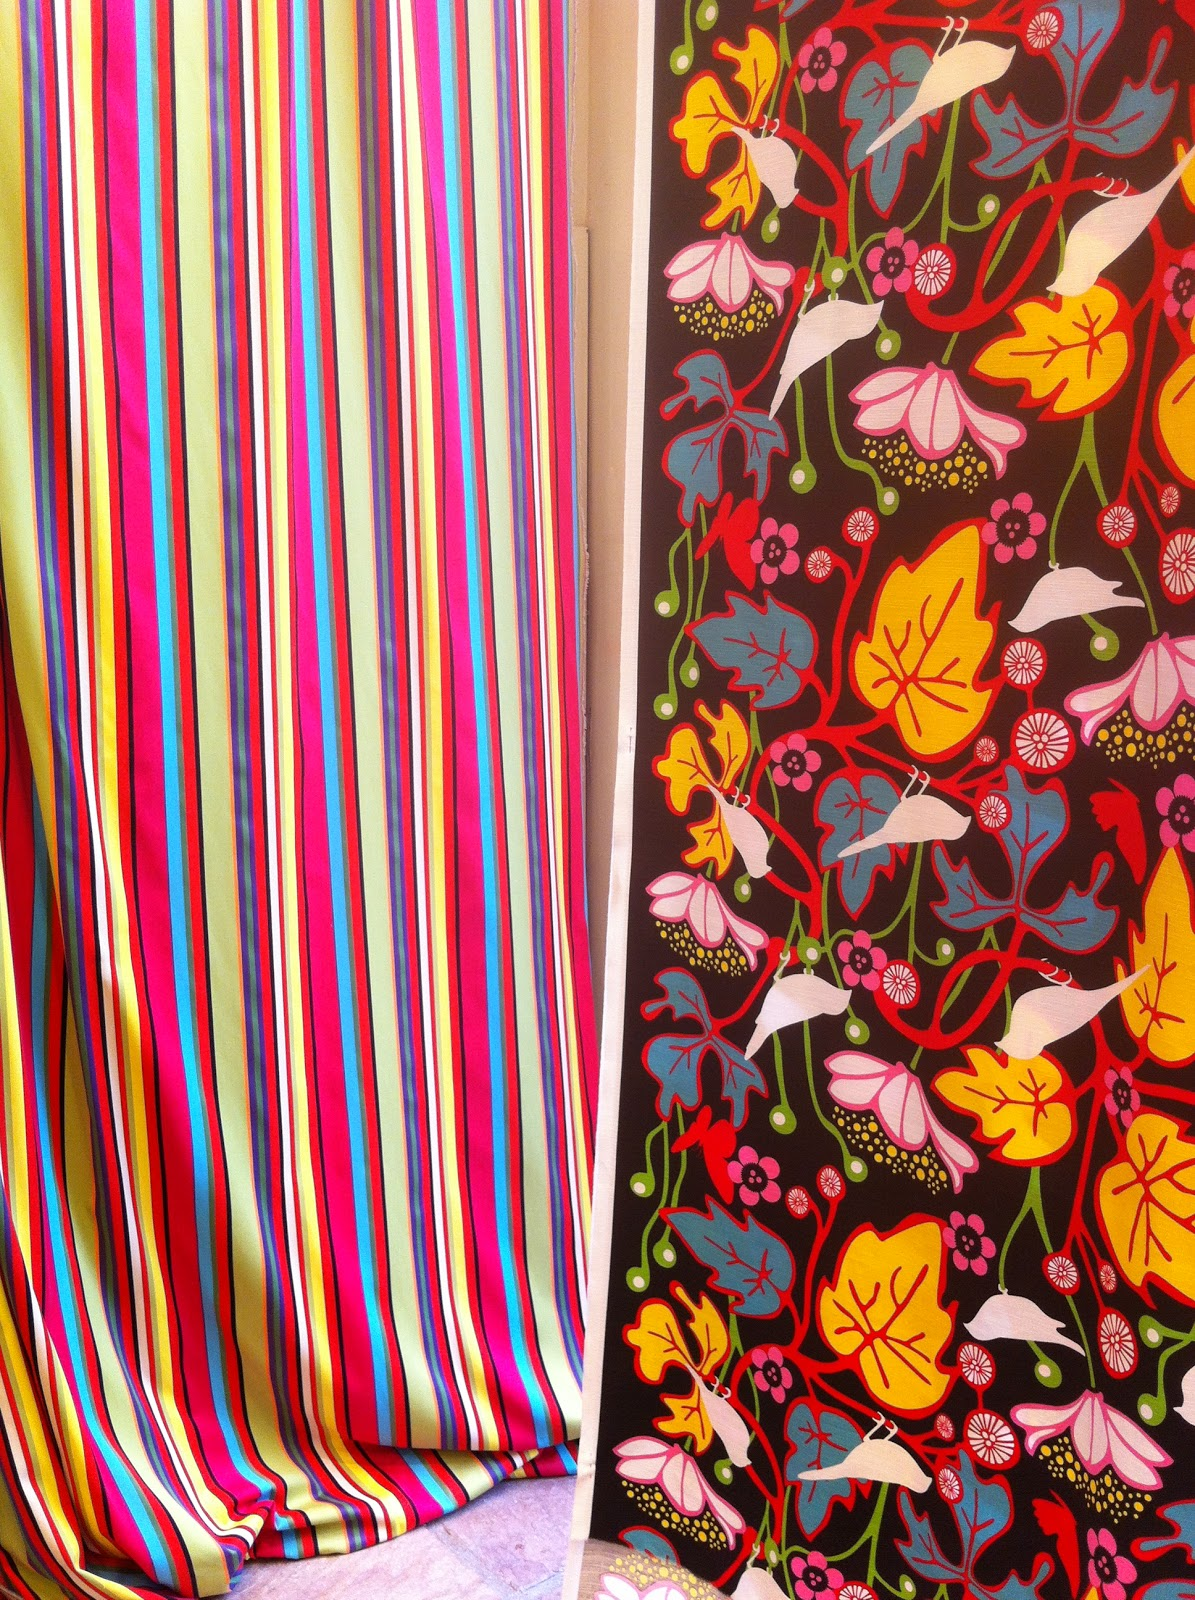 Telas de tapiceria para sillones silln ovalo telas romo tela para tapizar bay merengue beige - Tela de tapiceria para sillones ...